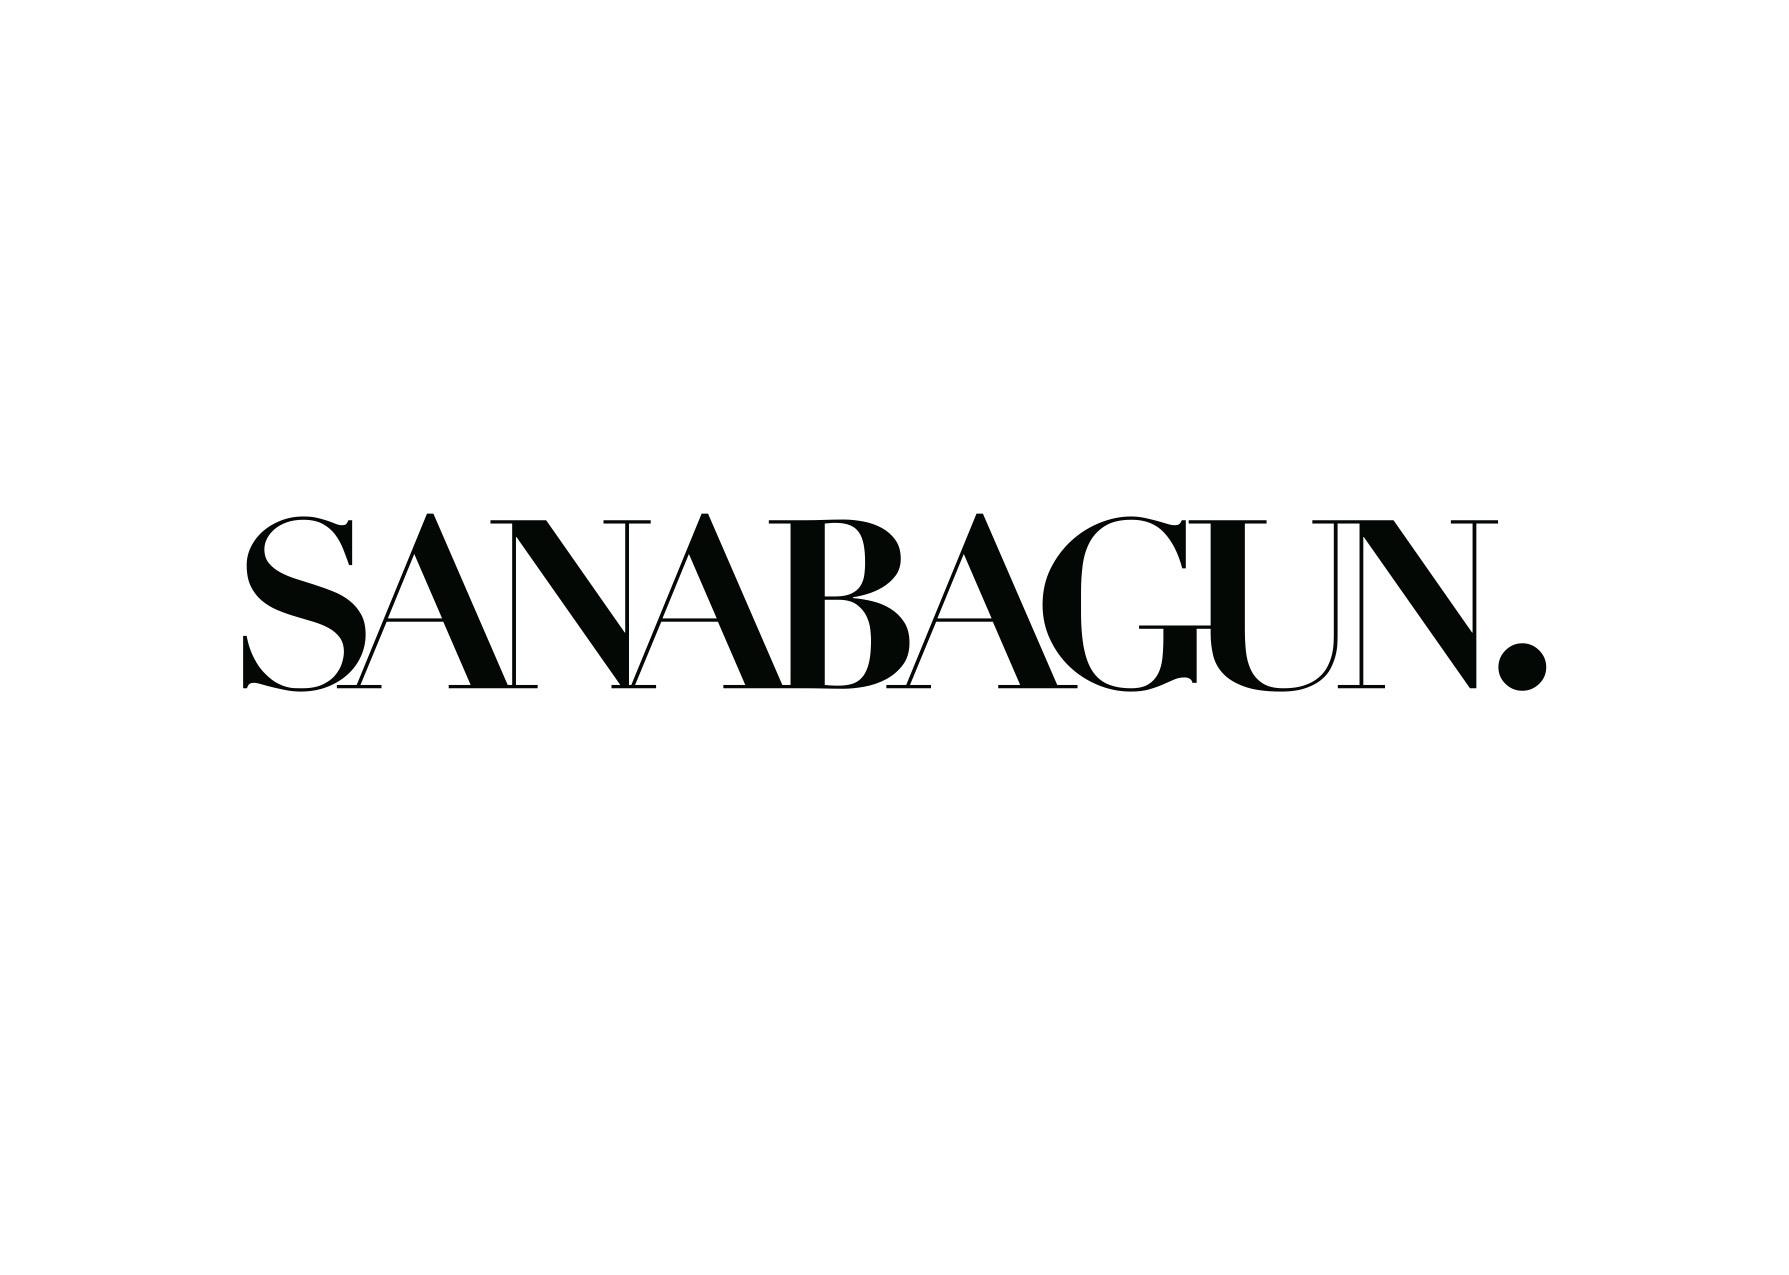 SANABAGUN.